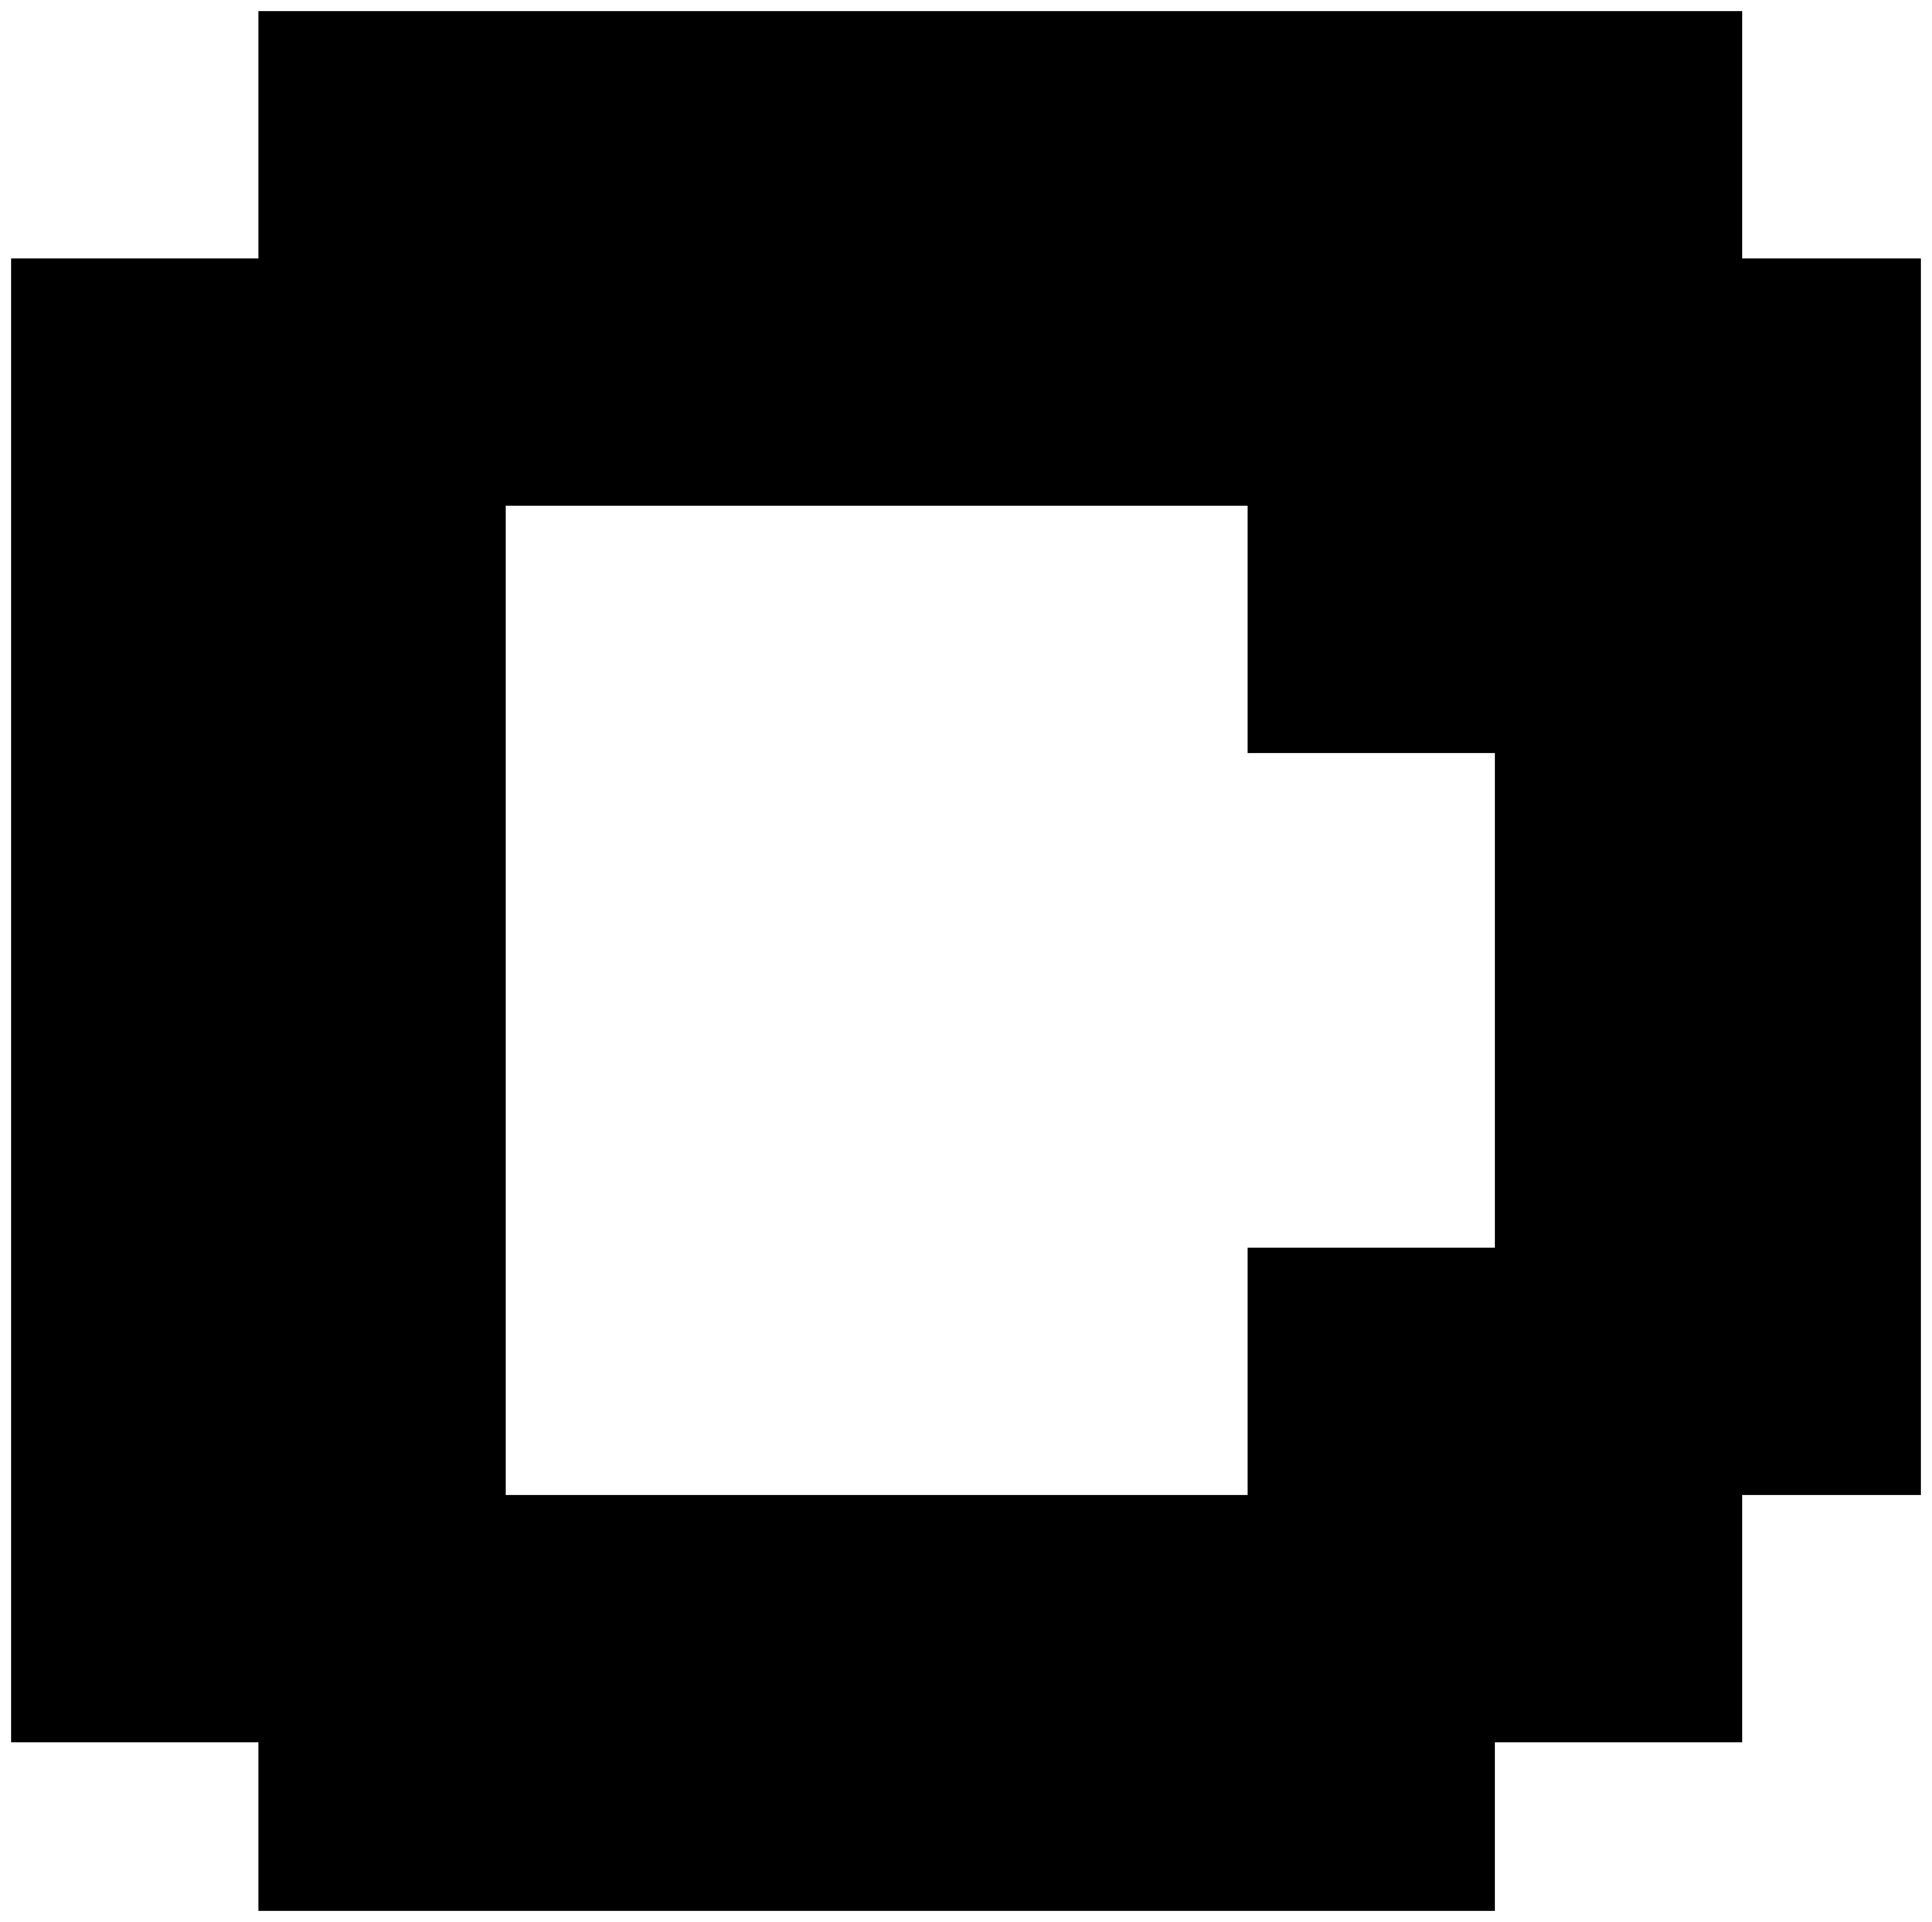 Black border png. Round frame clip art